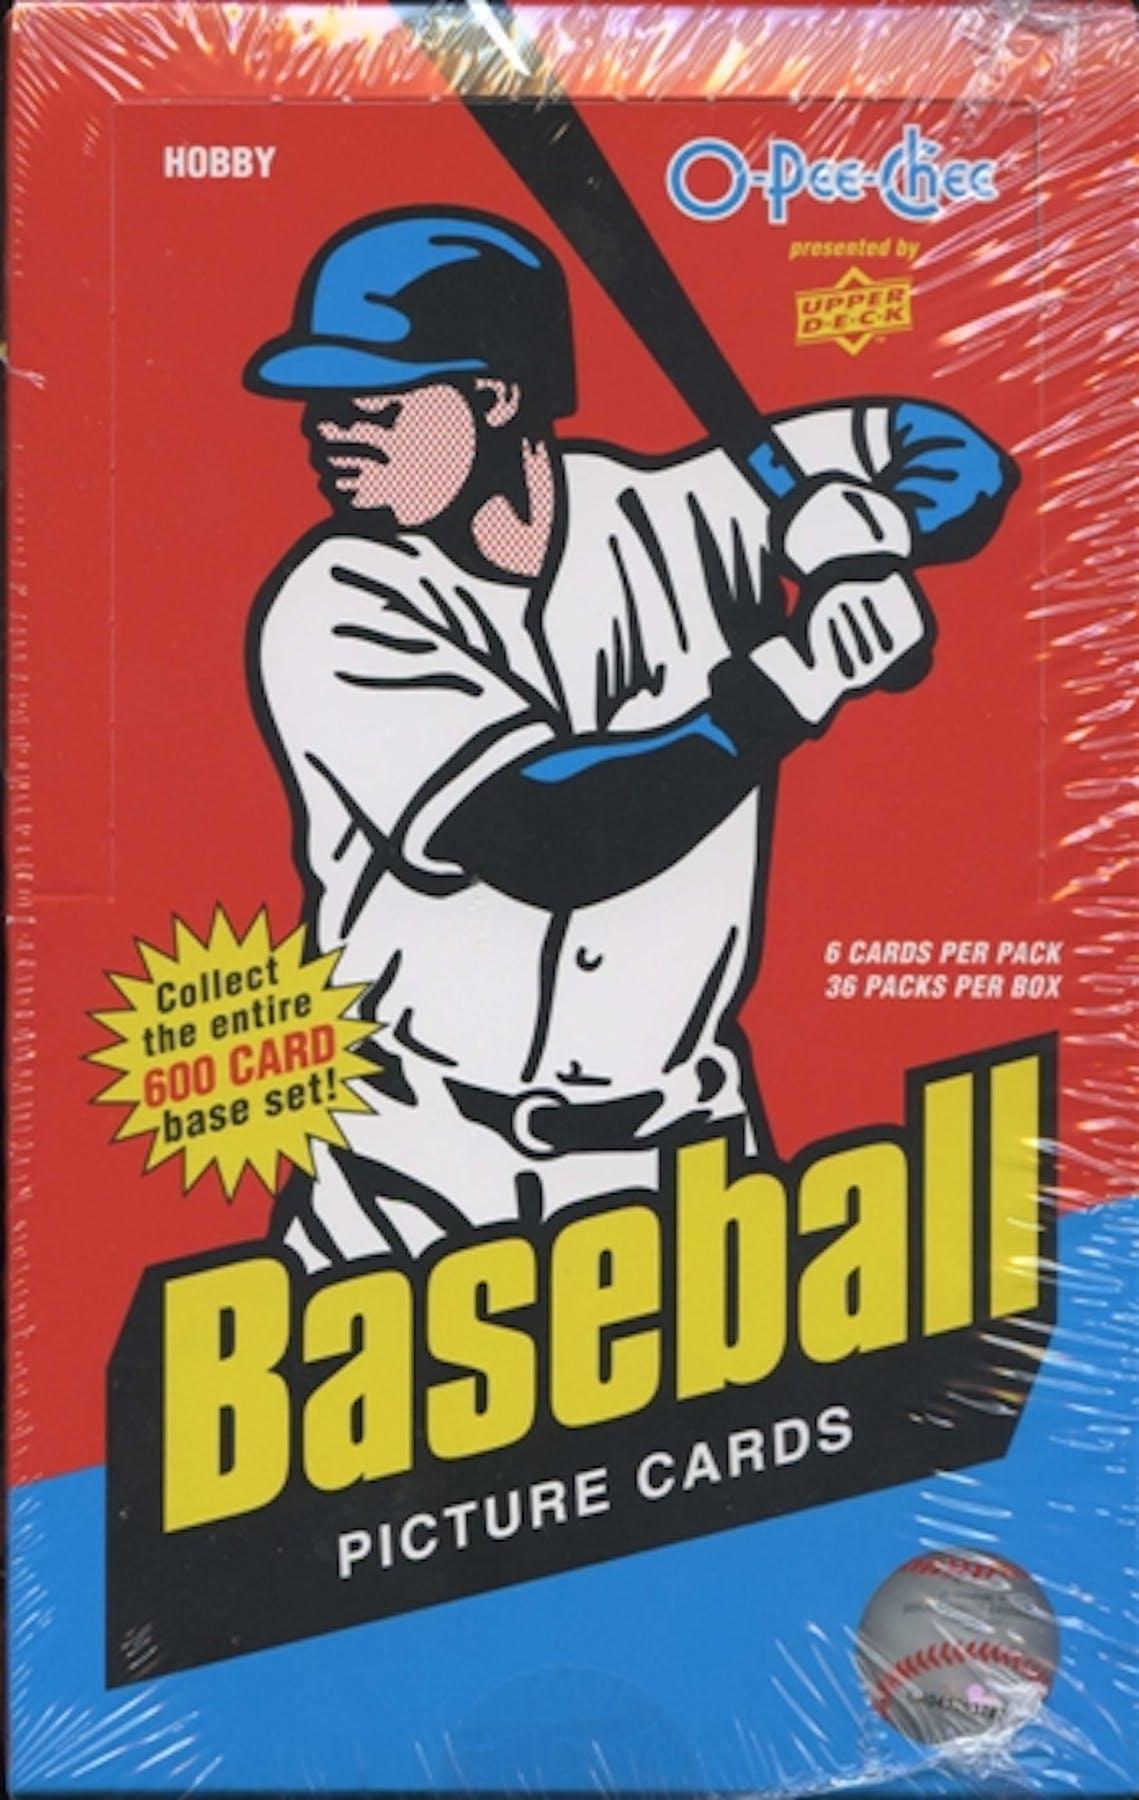 2009 Upper Deck O Pee Chee Baseball Hobby Box Da Card World